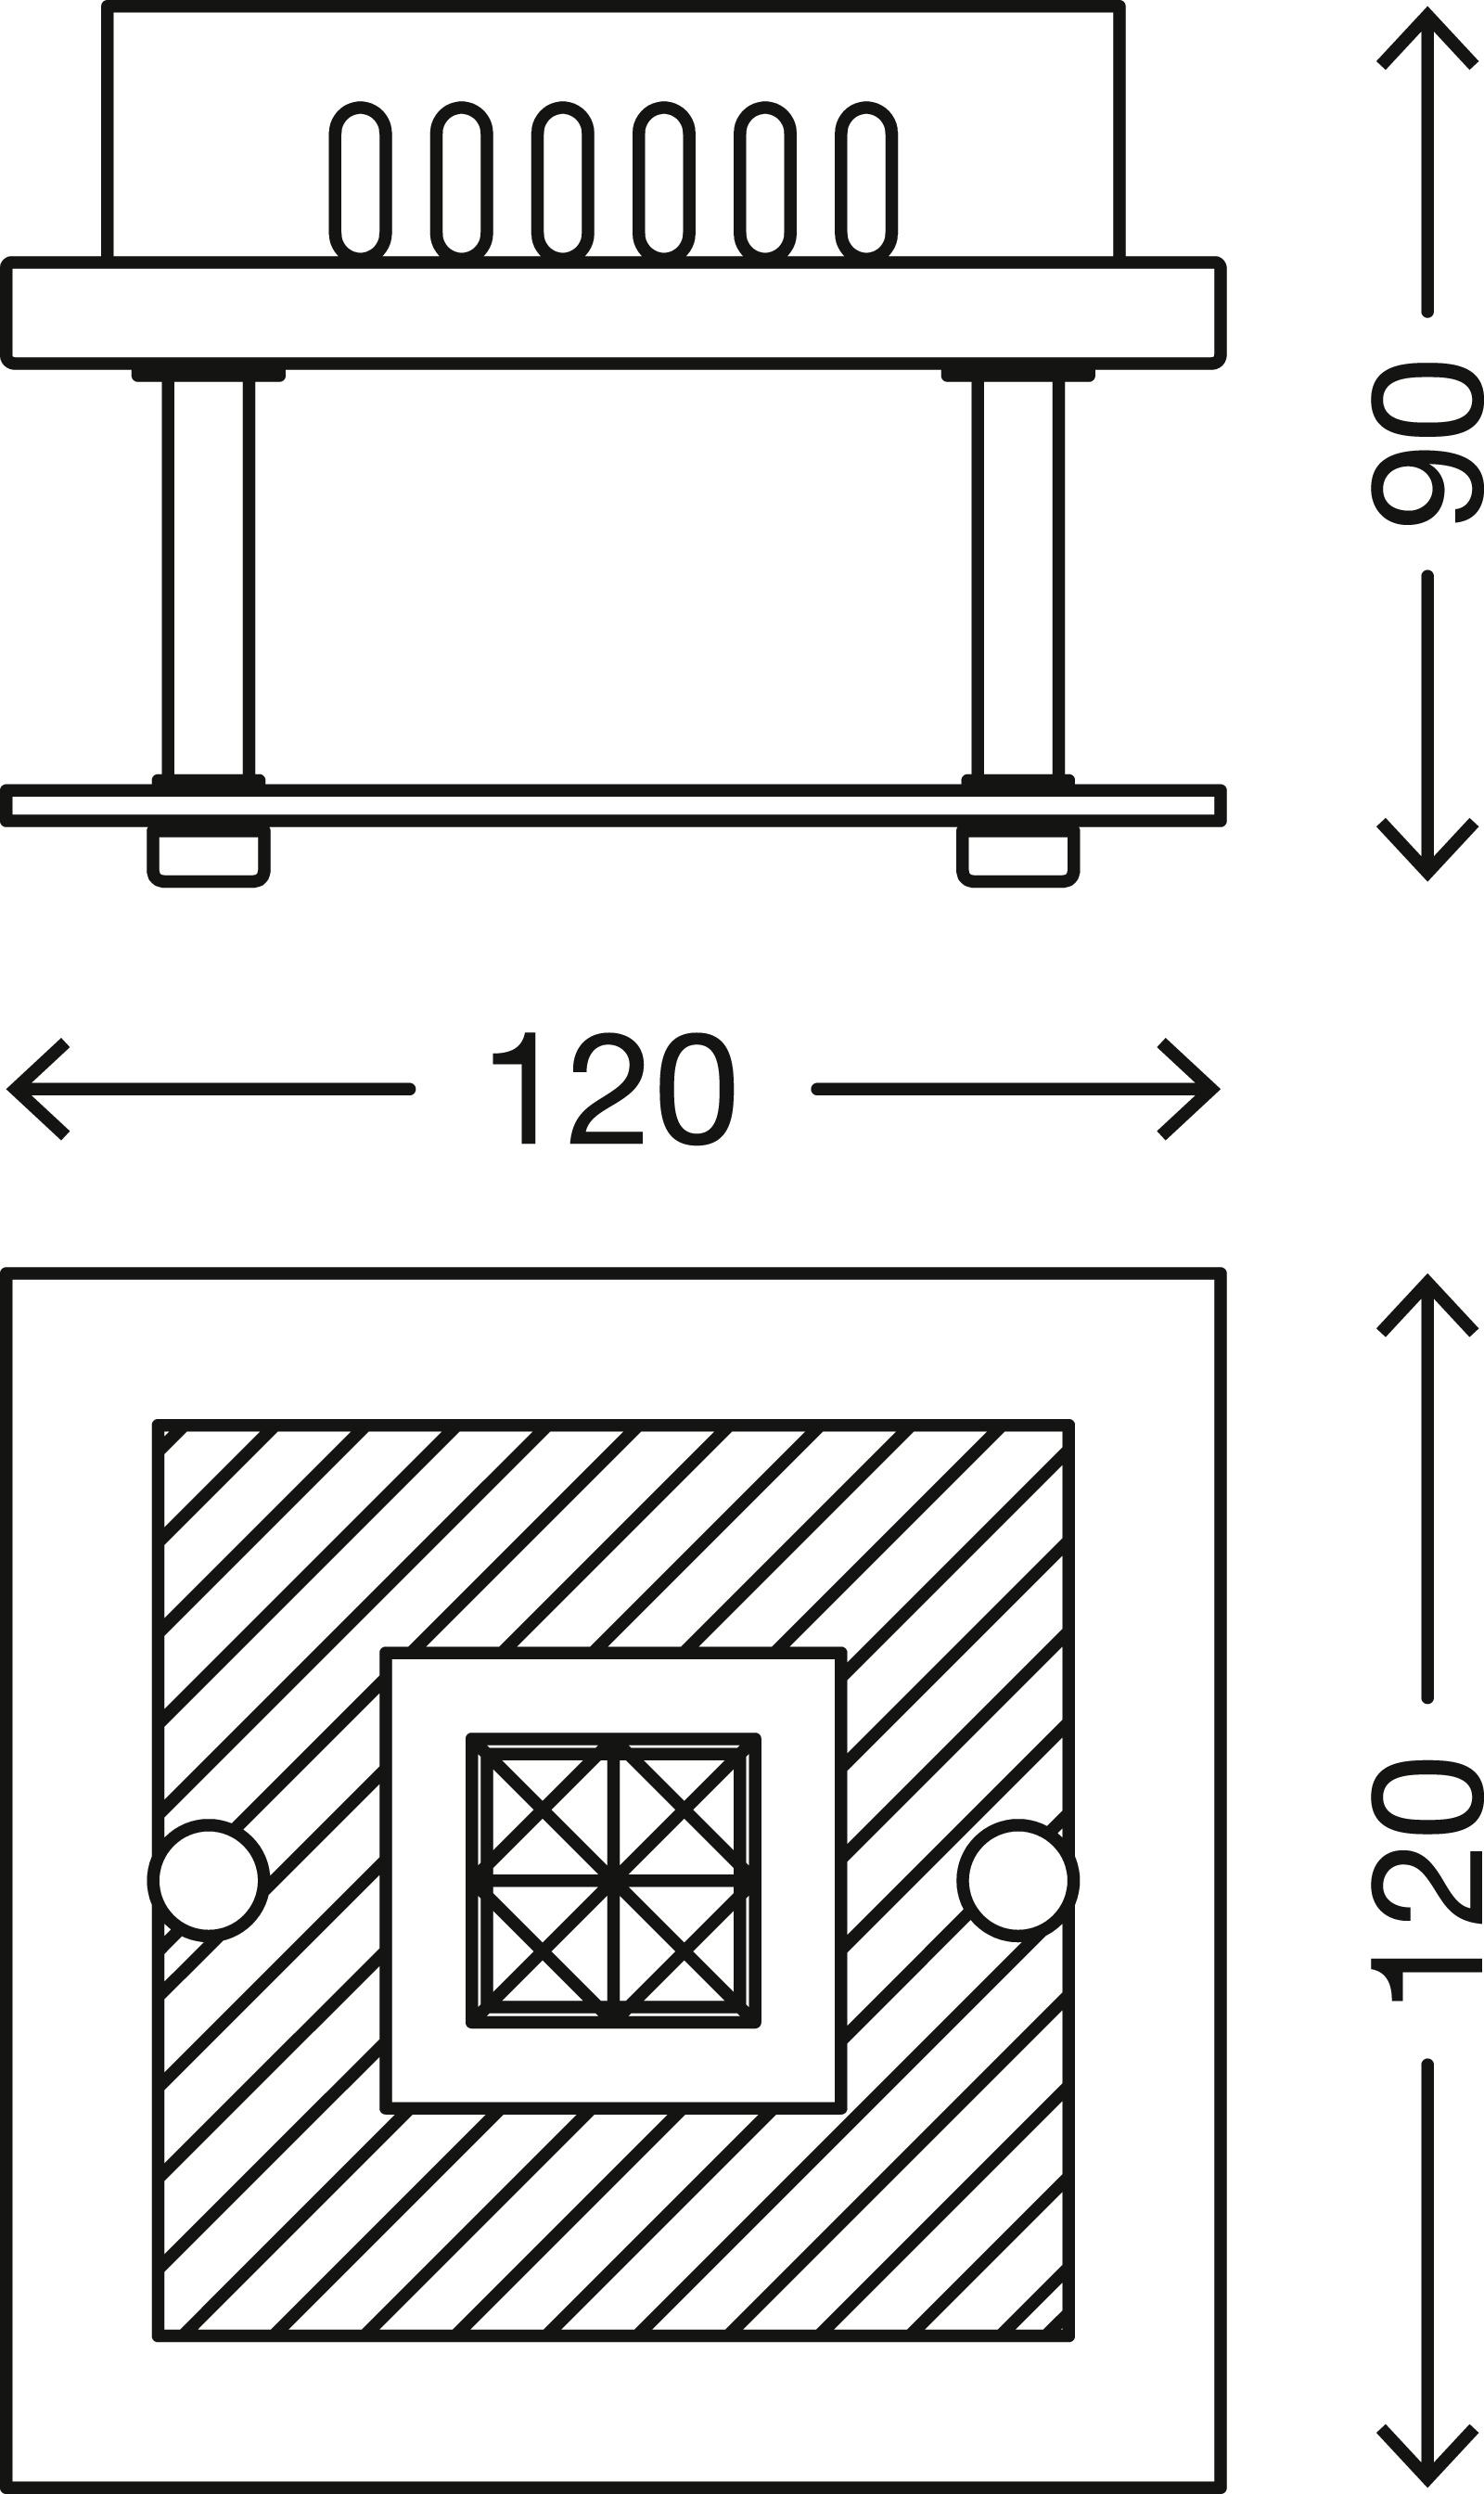 LED Deckenleuchte, 12 cm, 3 W, Chrom